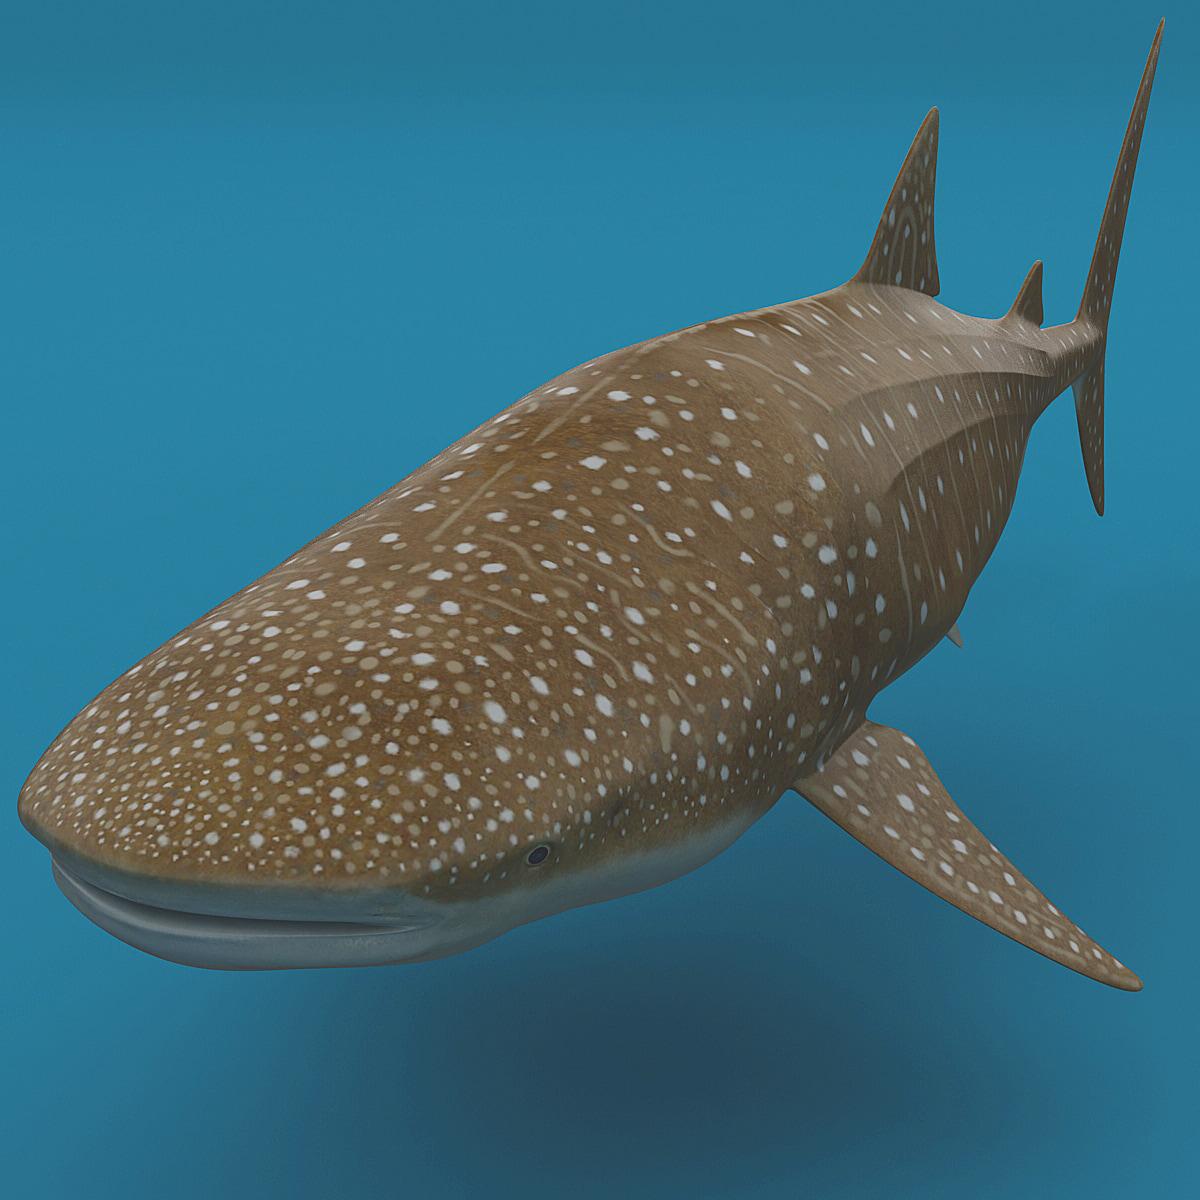 Whale_Shark_01.jpg